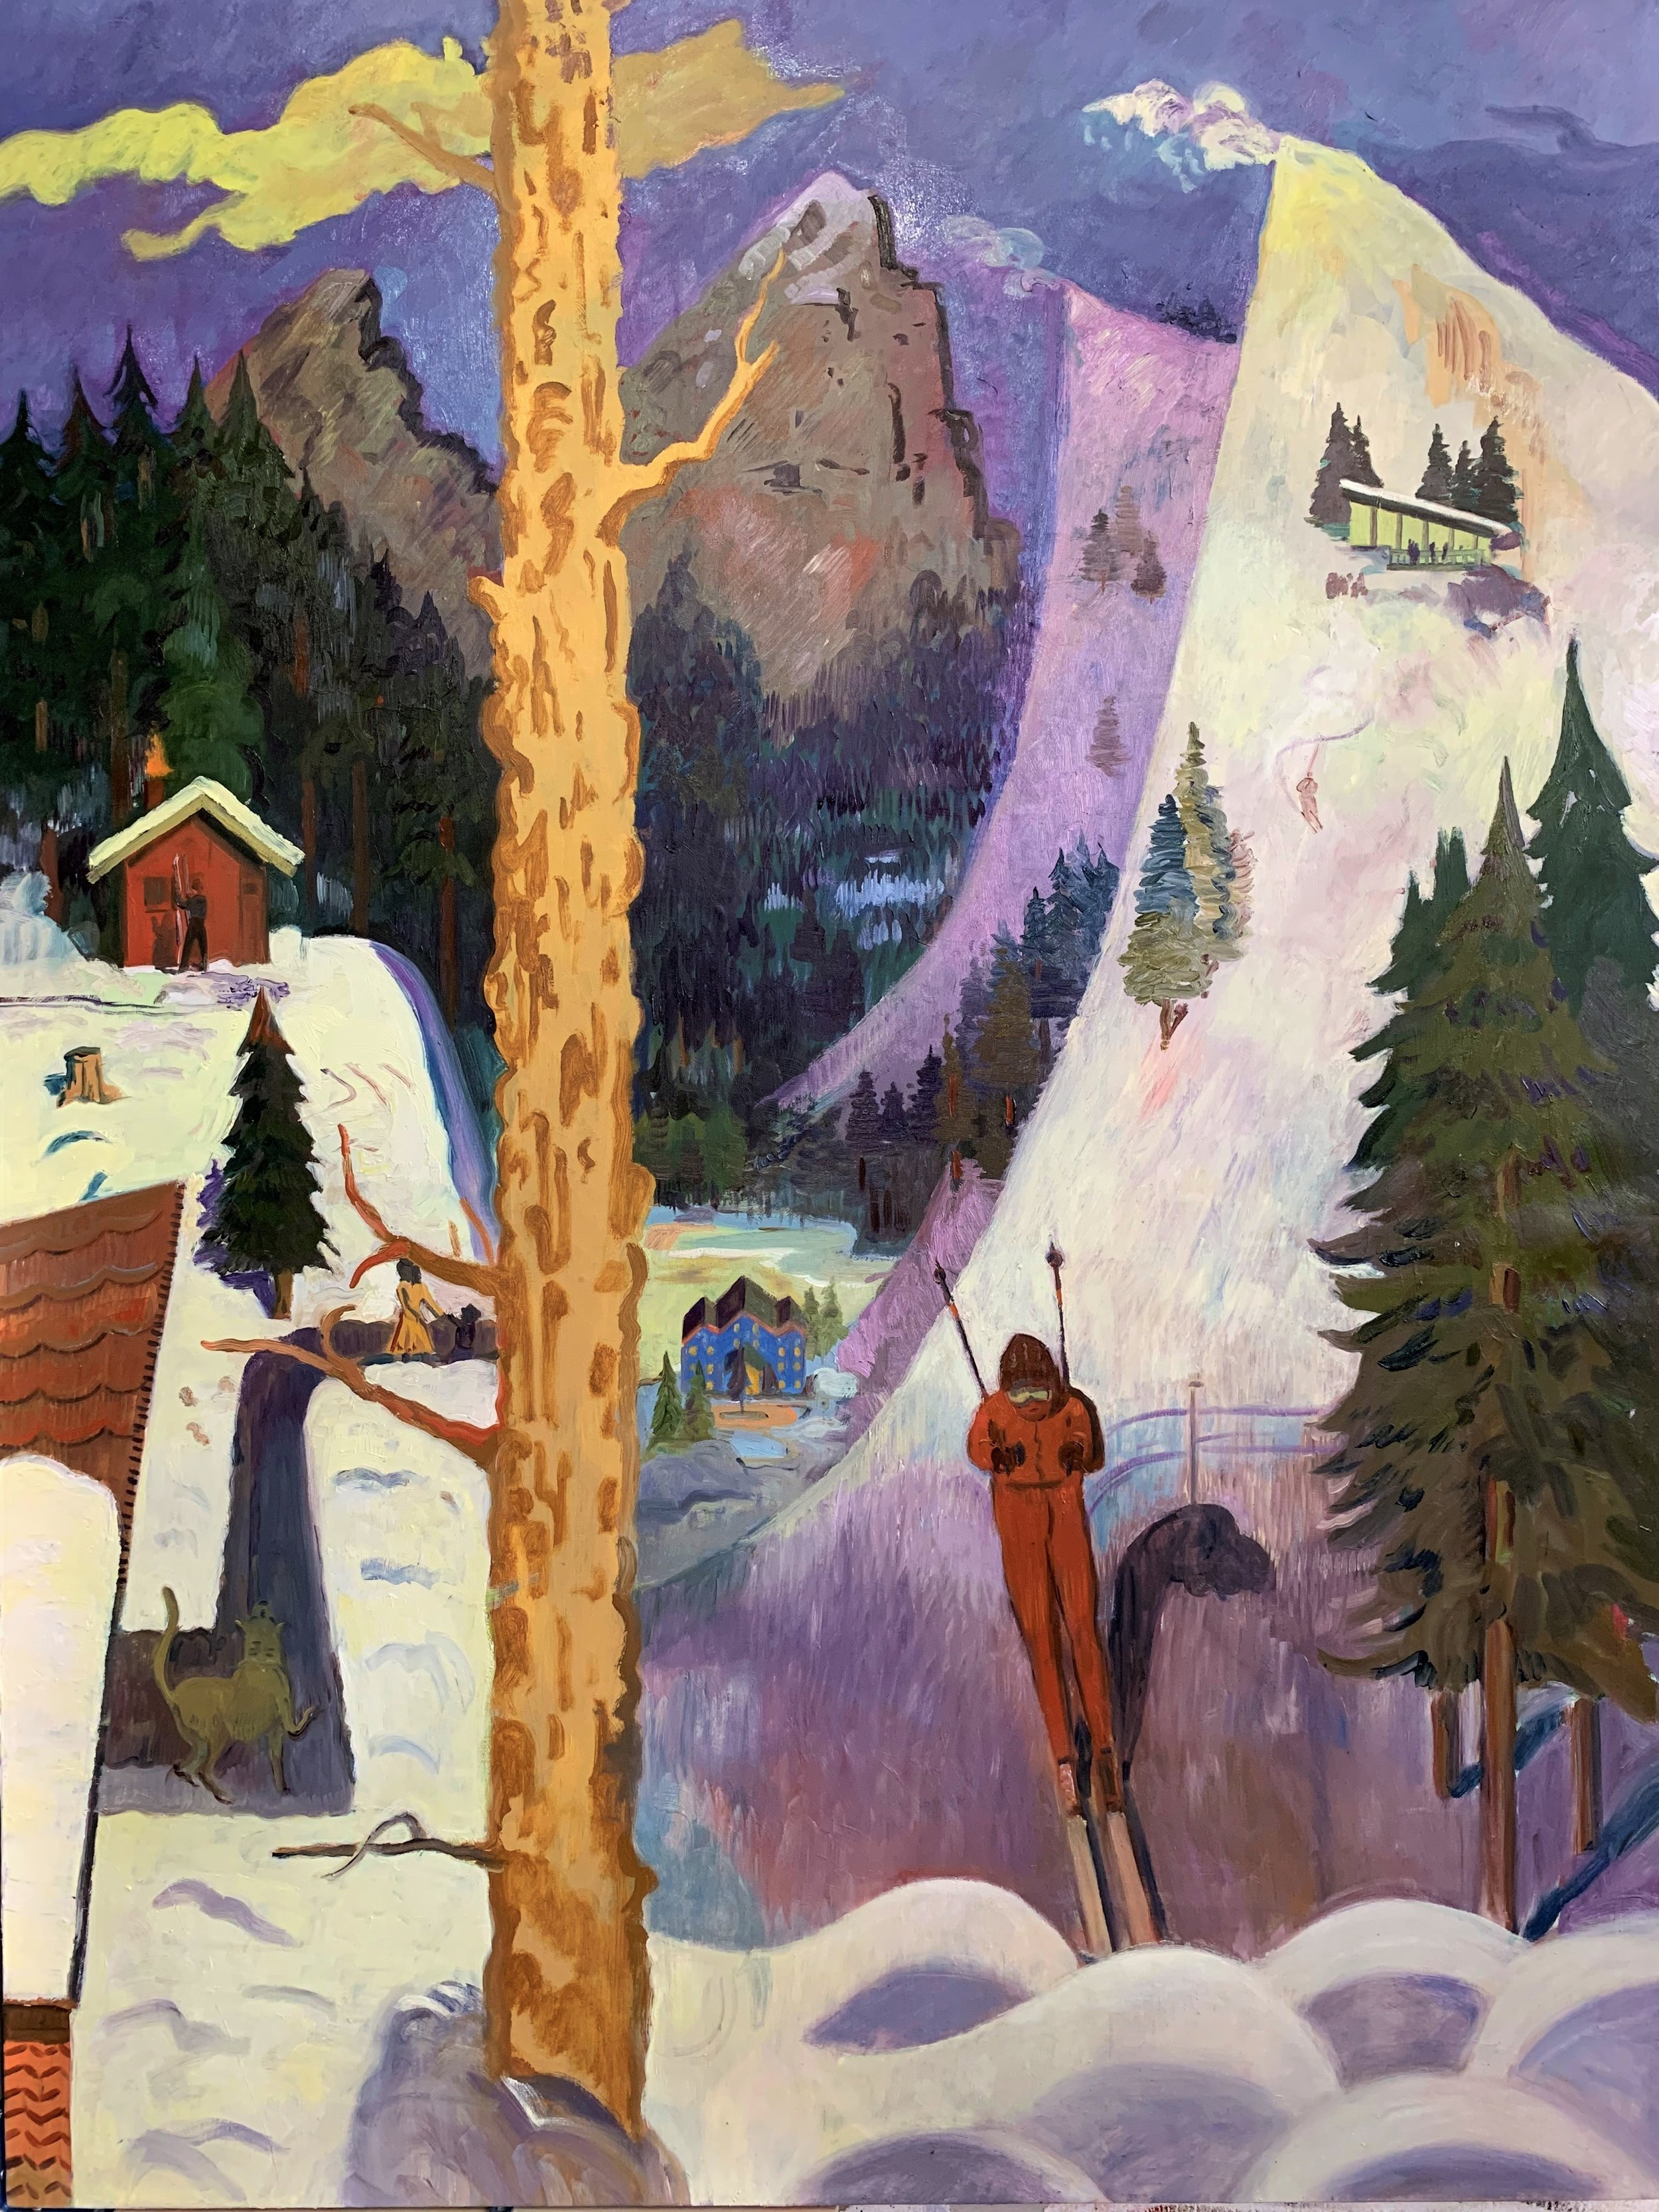 Aaron Zulpo_ The Skiier_ 2018_ 48 x 36 inches.jpeg